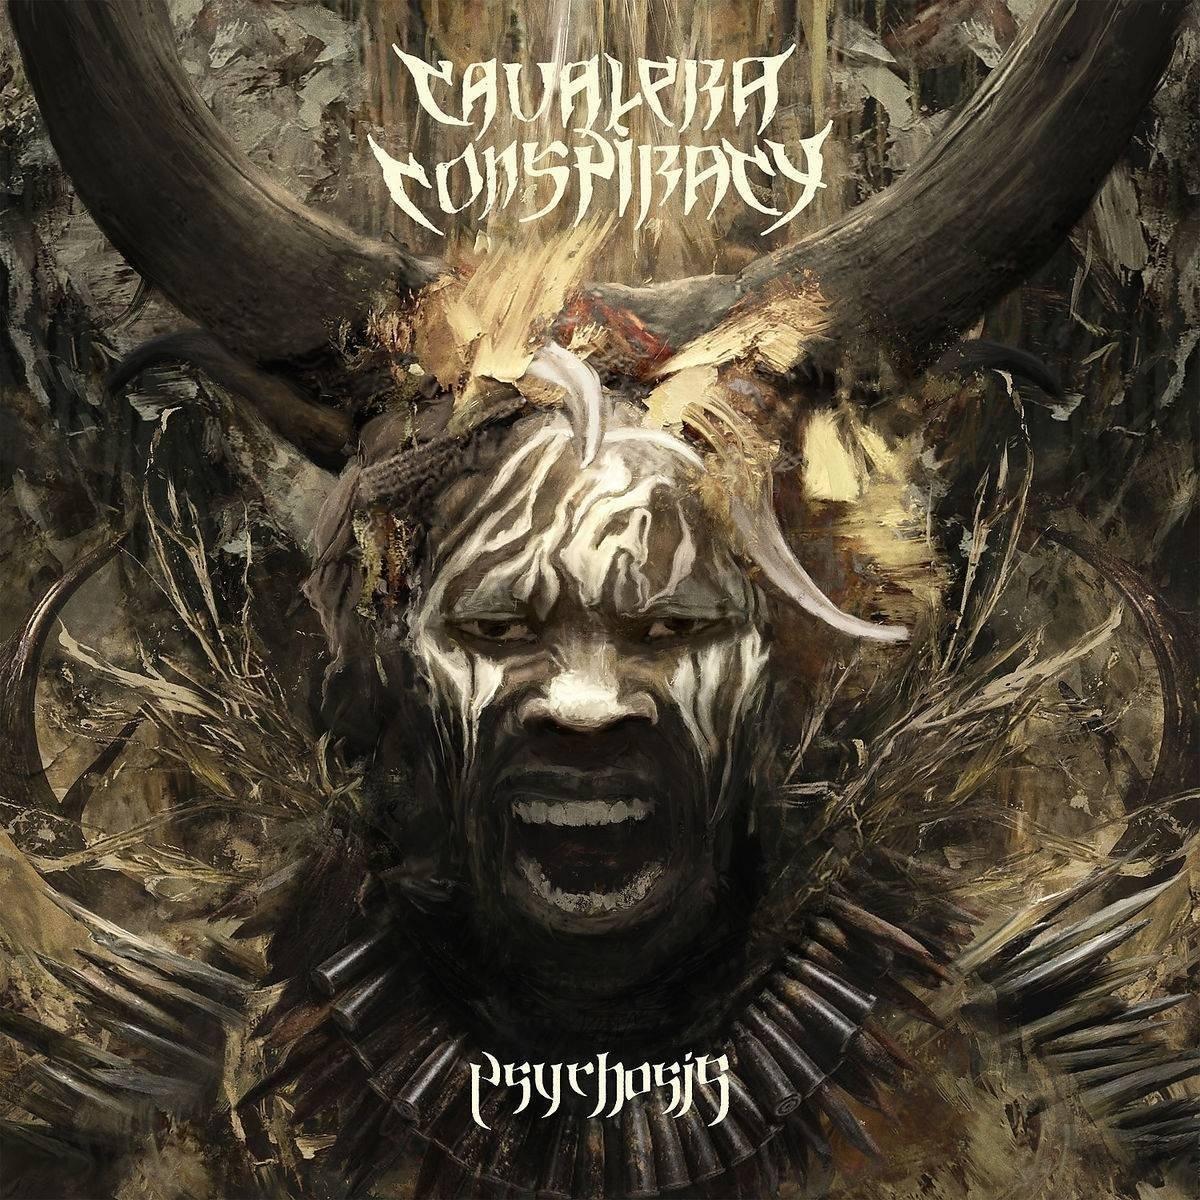 Cavalera Conspiracy - Psychosis (CD)